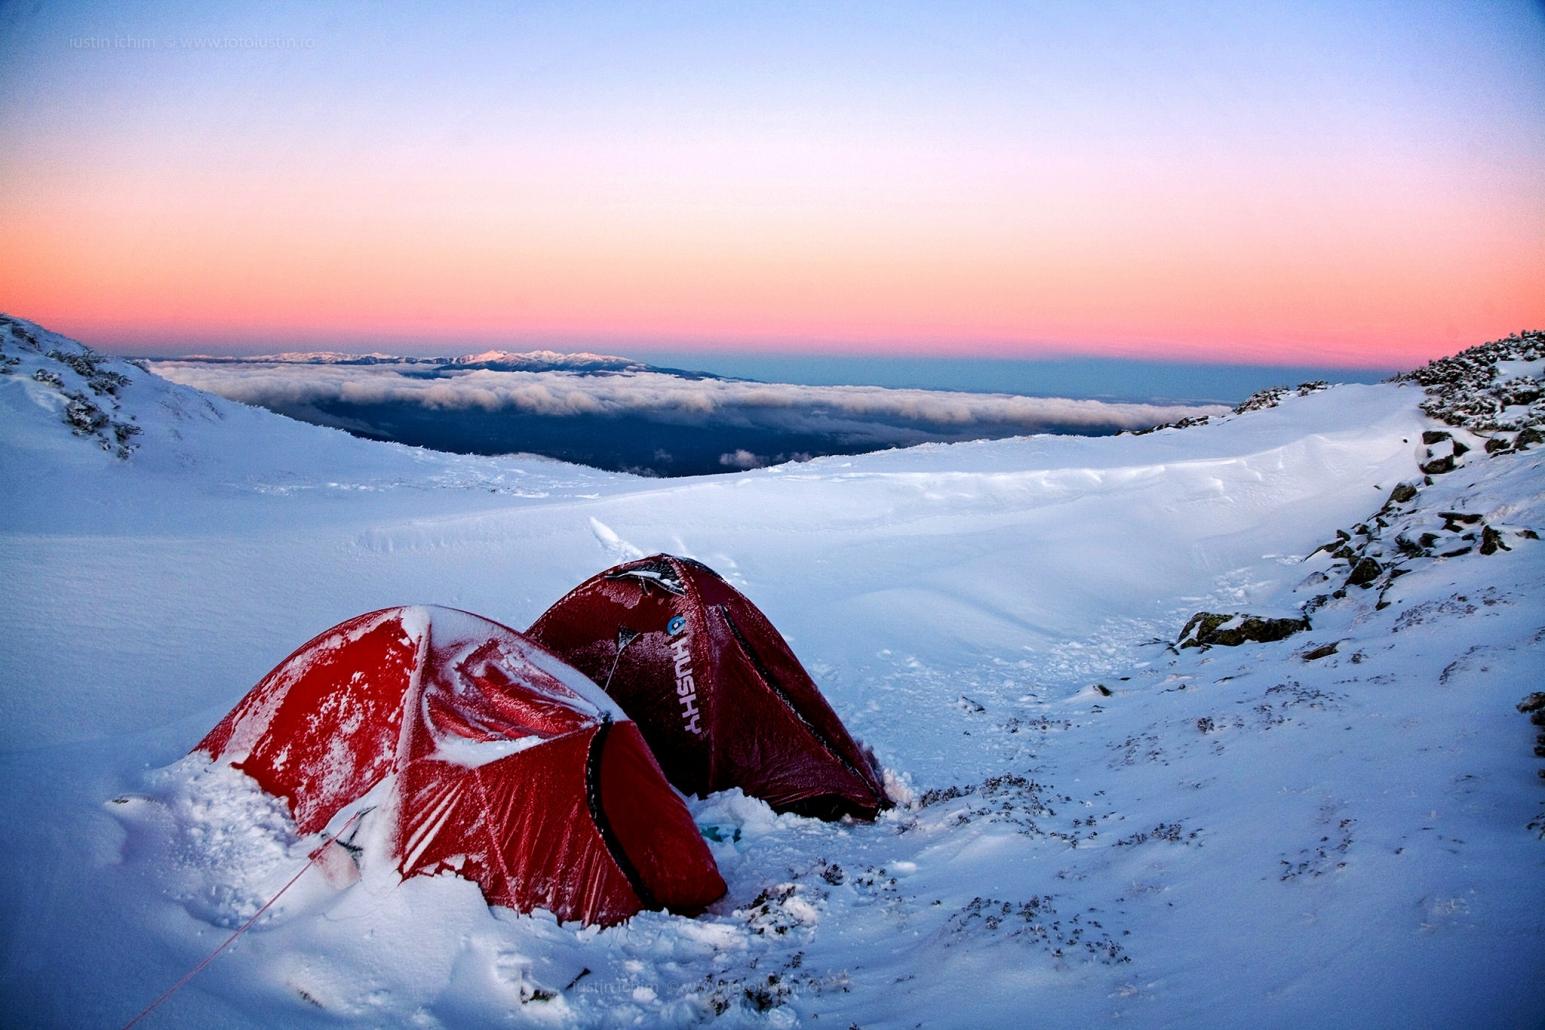 Iarna la munte cu cortul